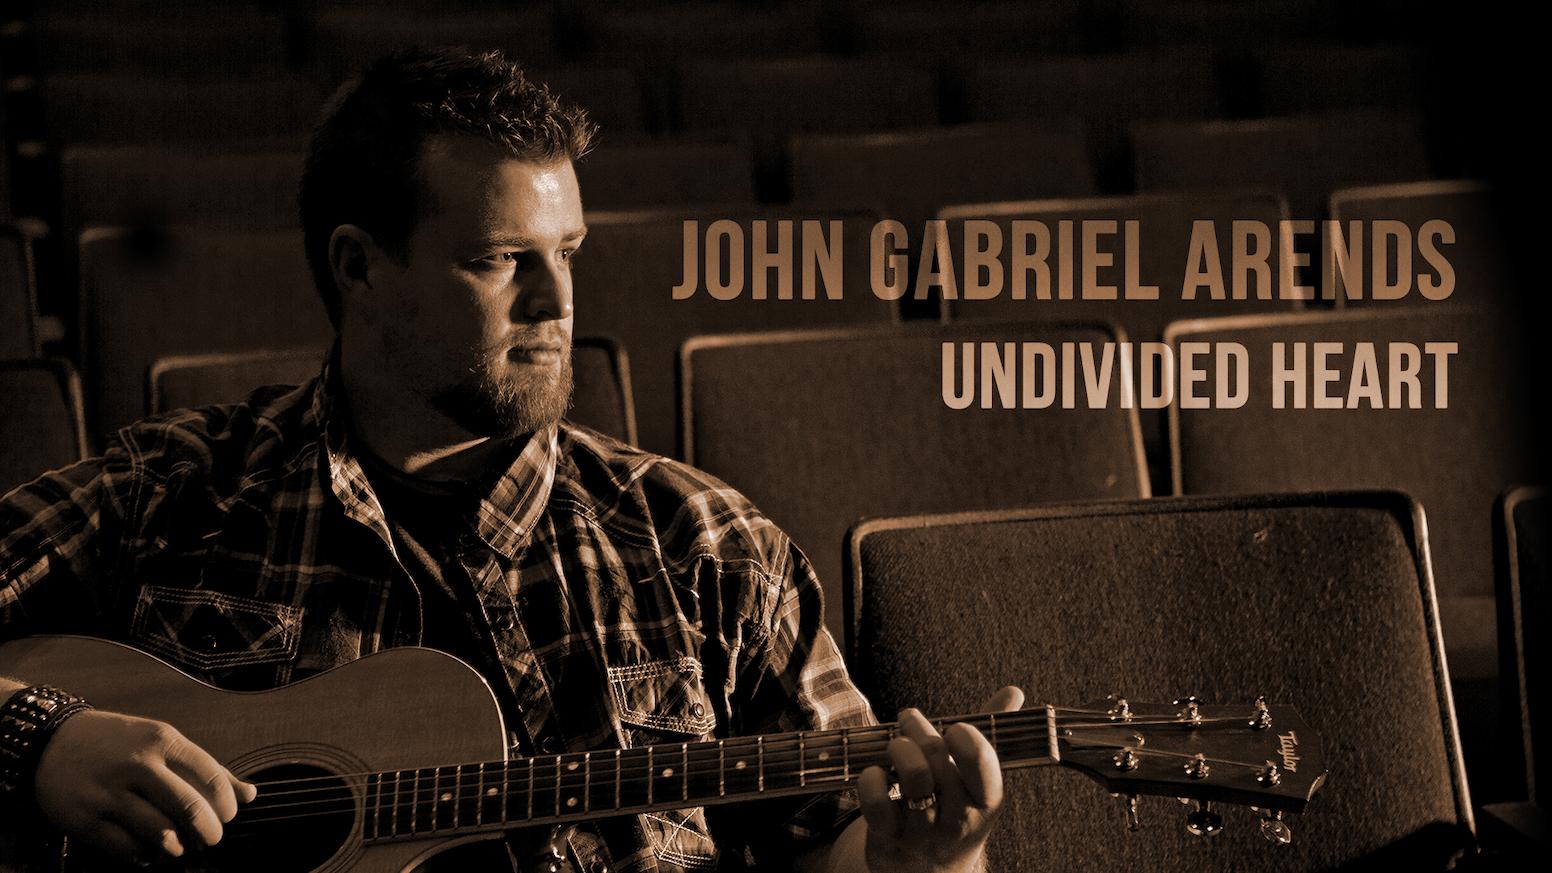 Undivided Heart A Worship Album By John Gabriel Arends By John